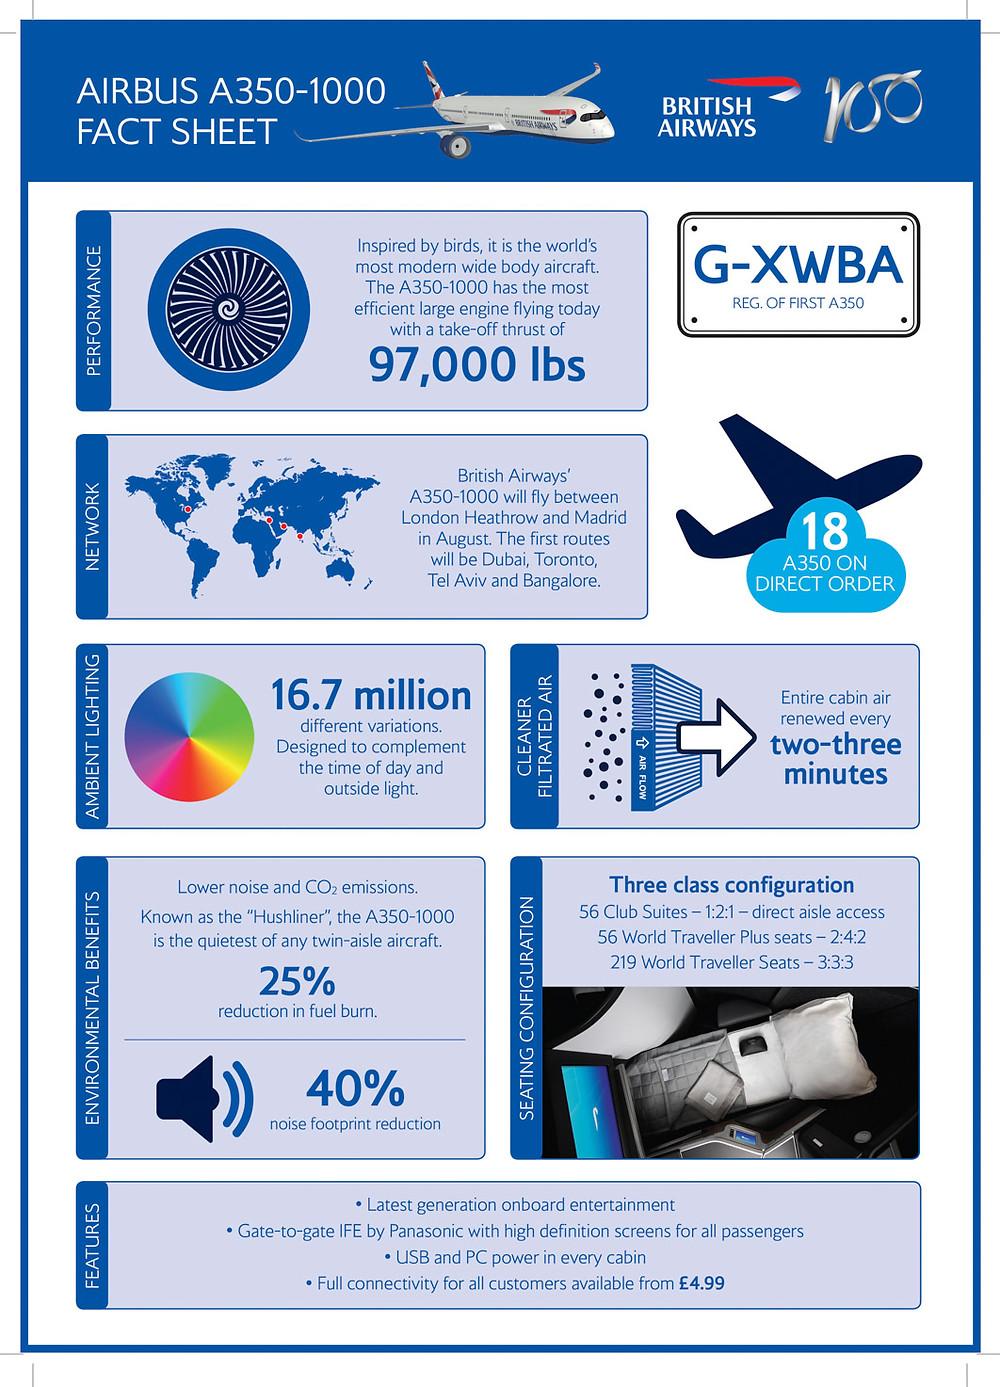 BA A350-1000 fact sheet